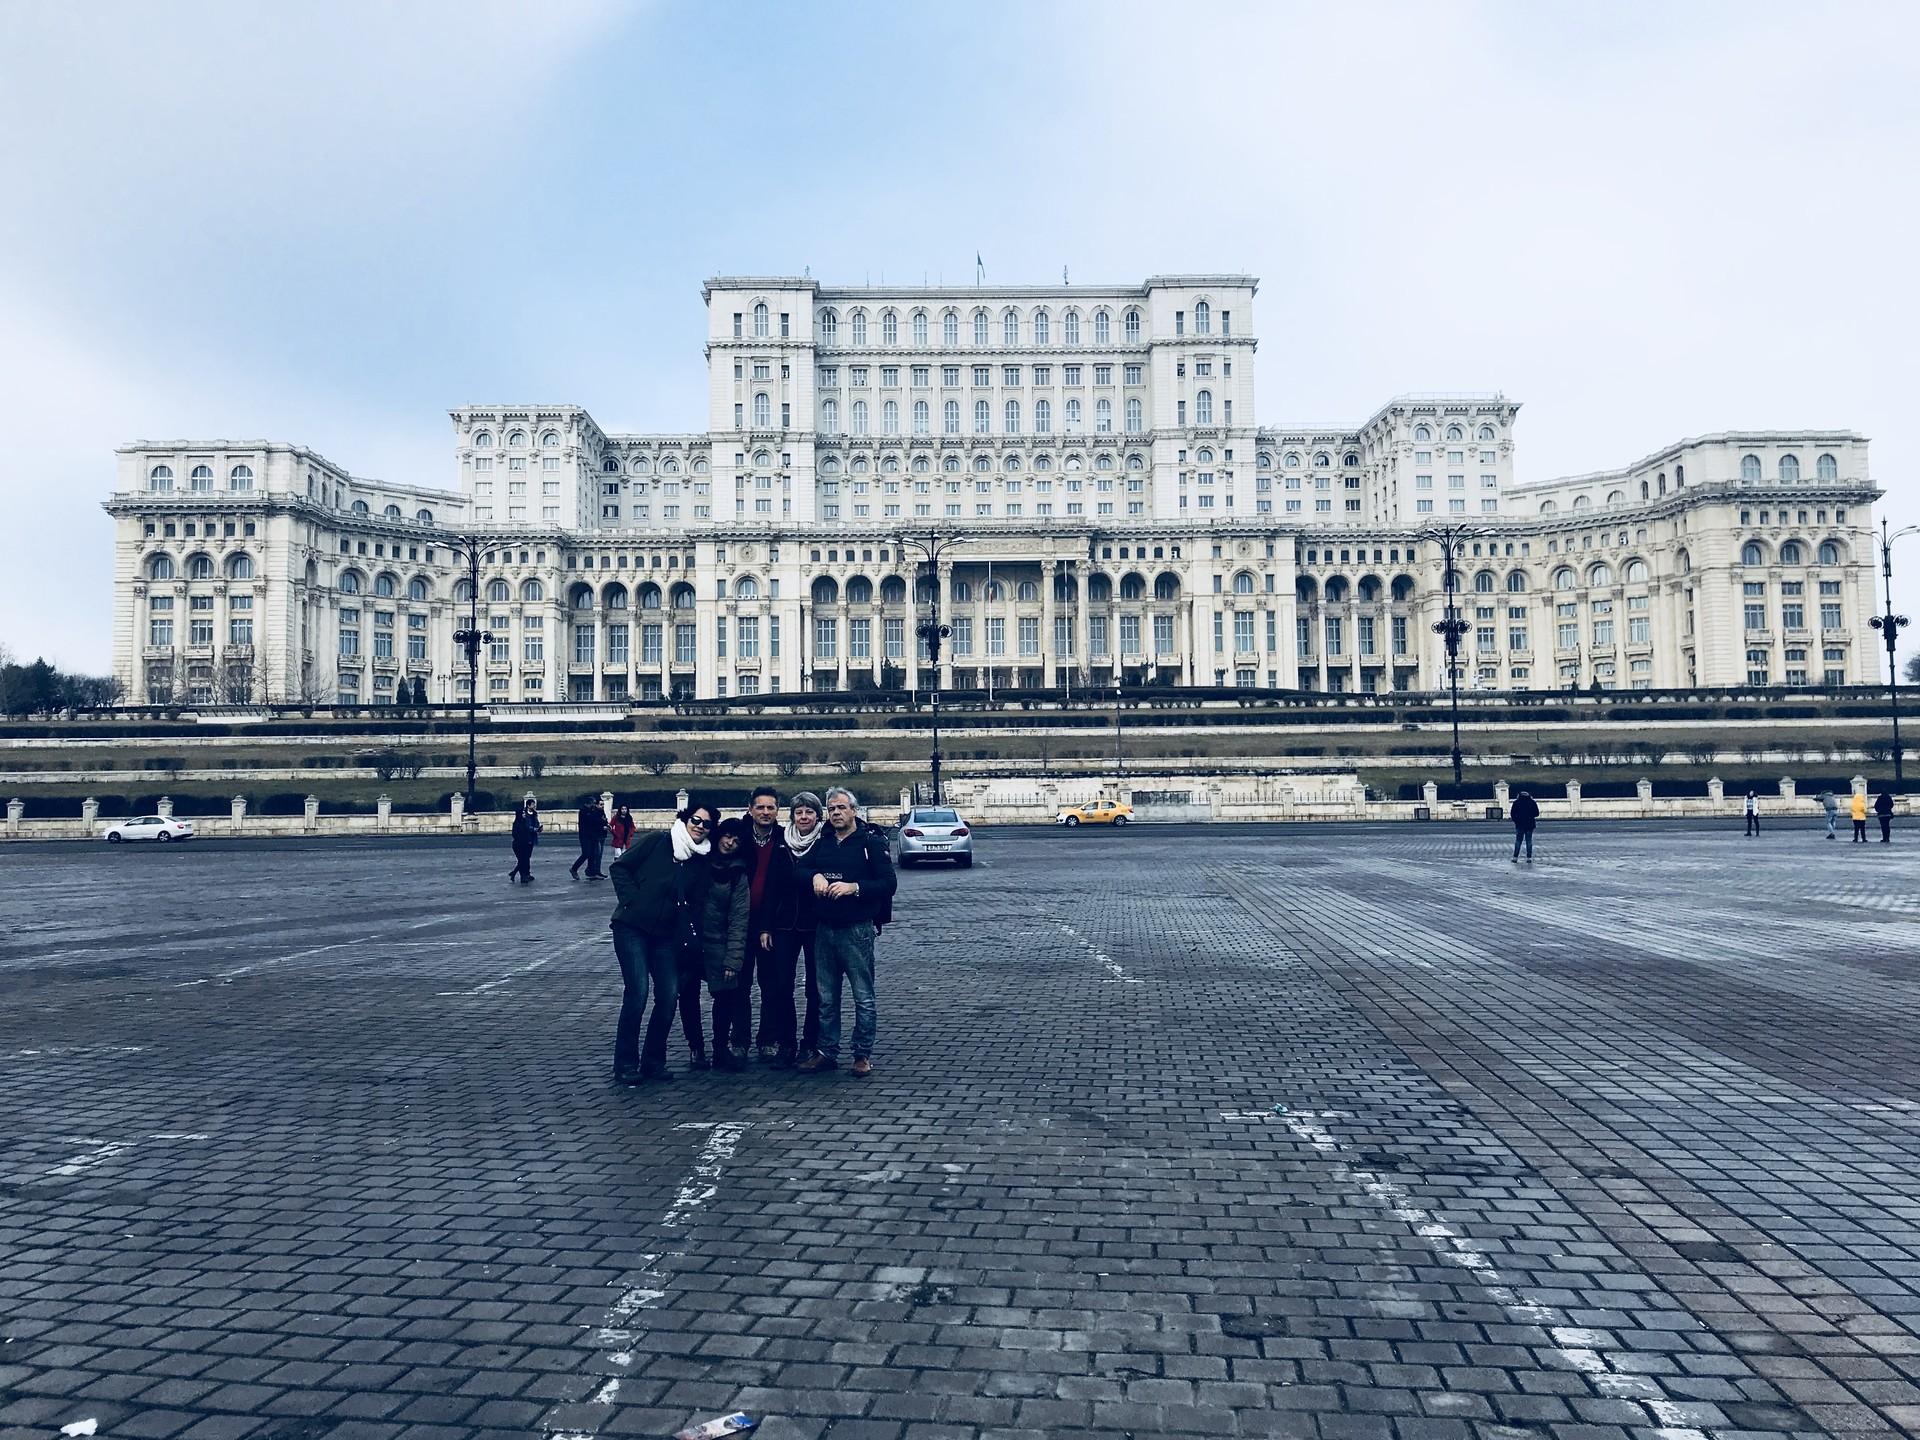 palazzo-parlamento-bucarest-19589578cd16